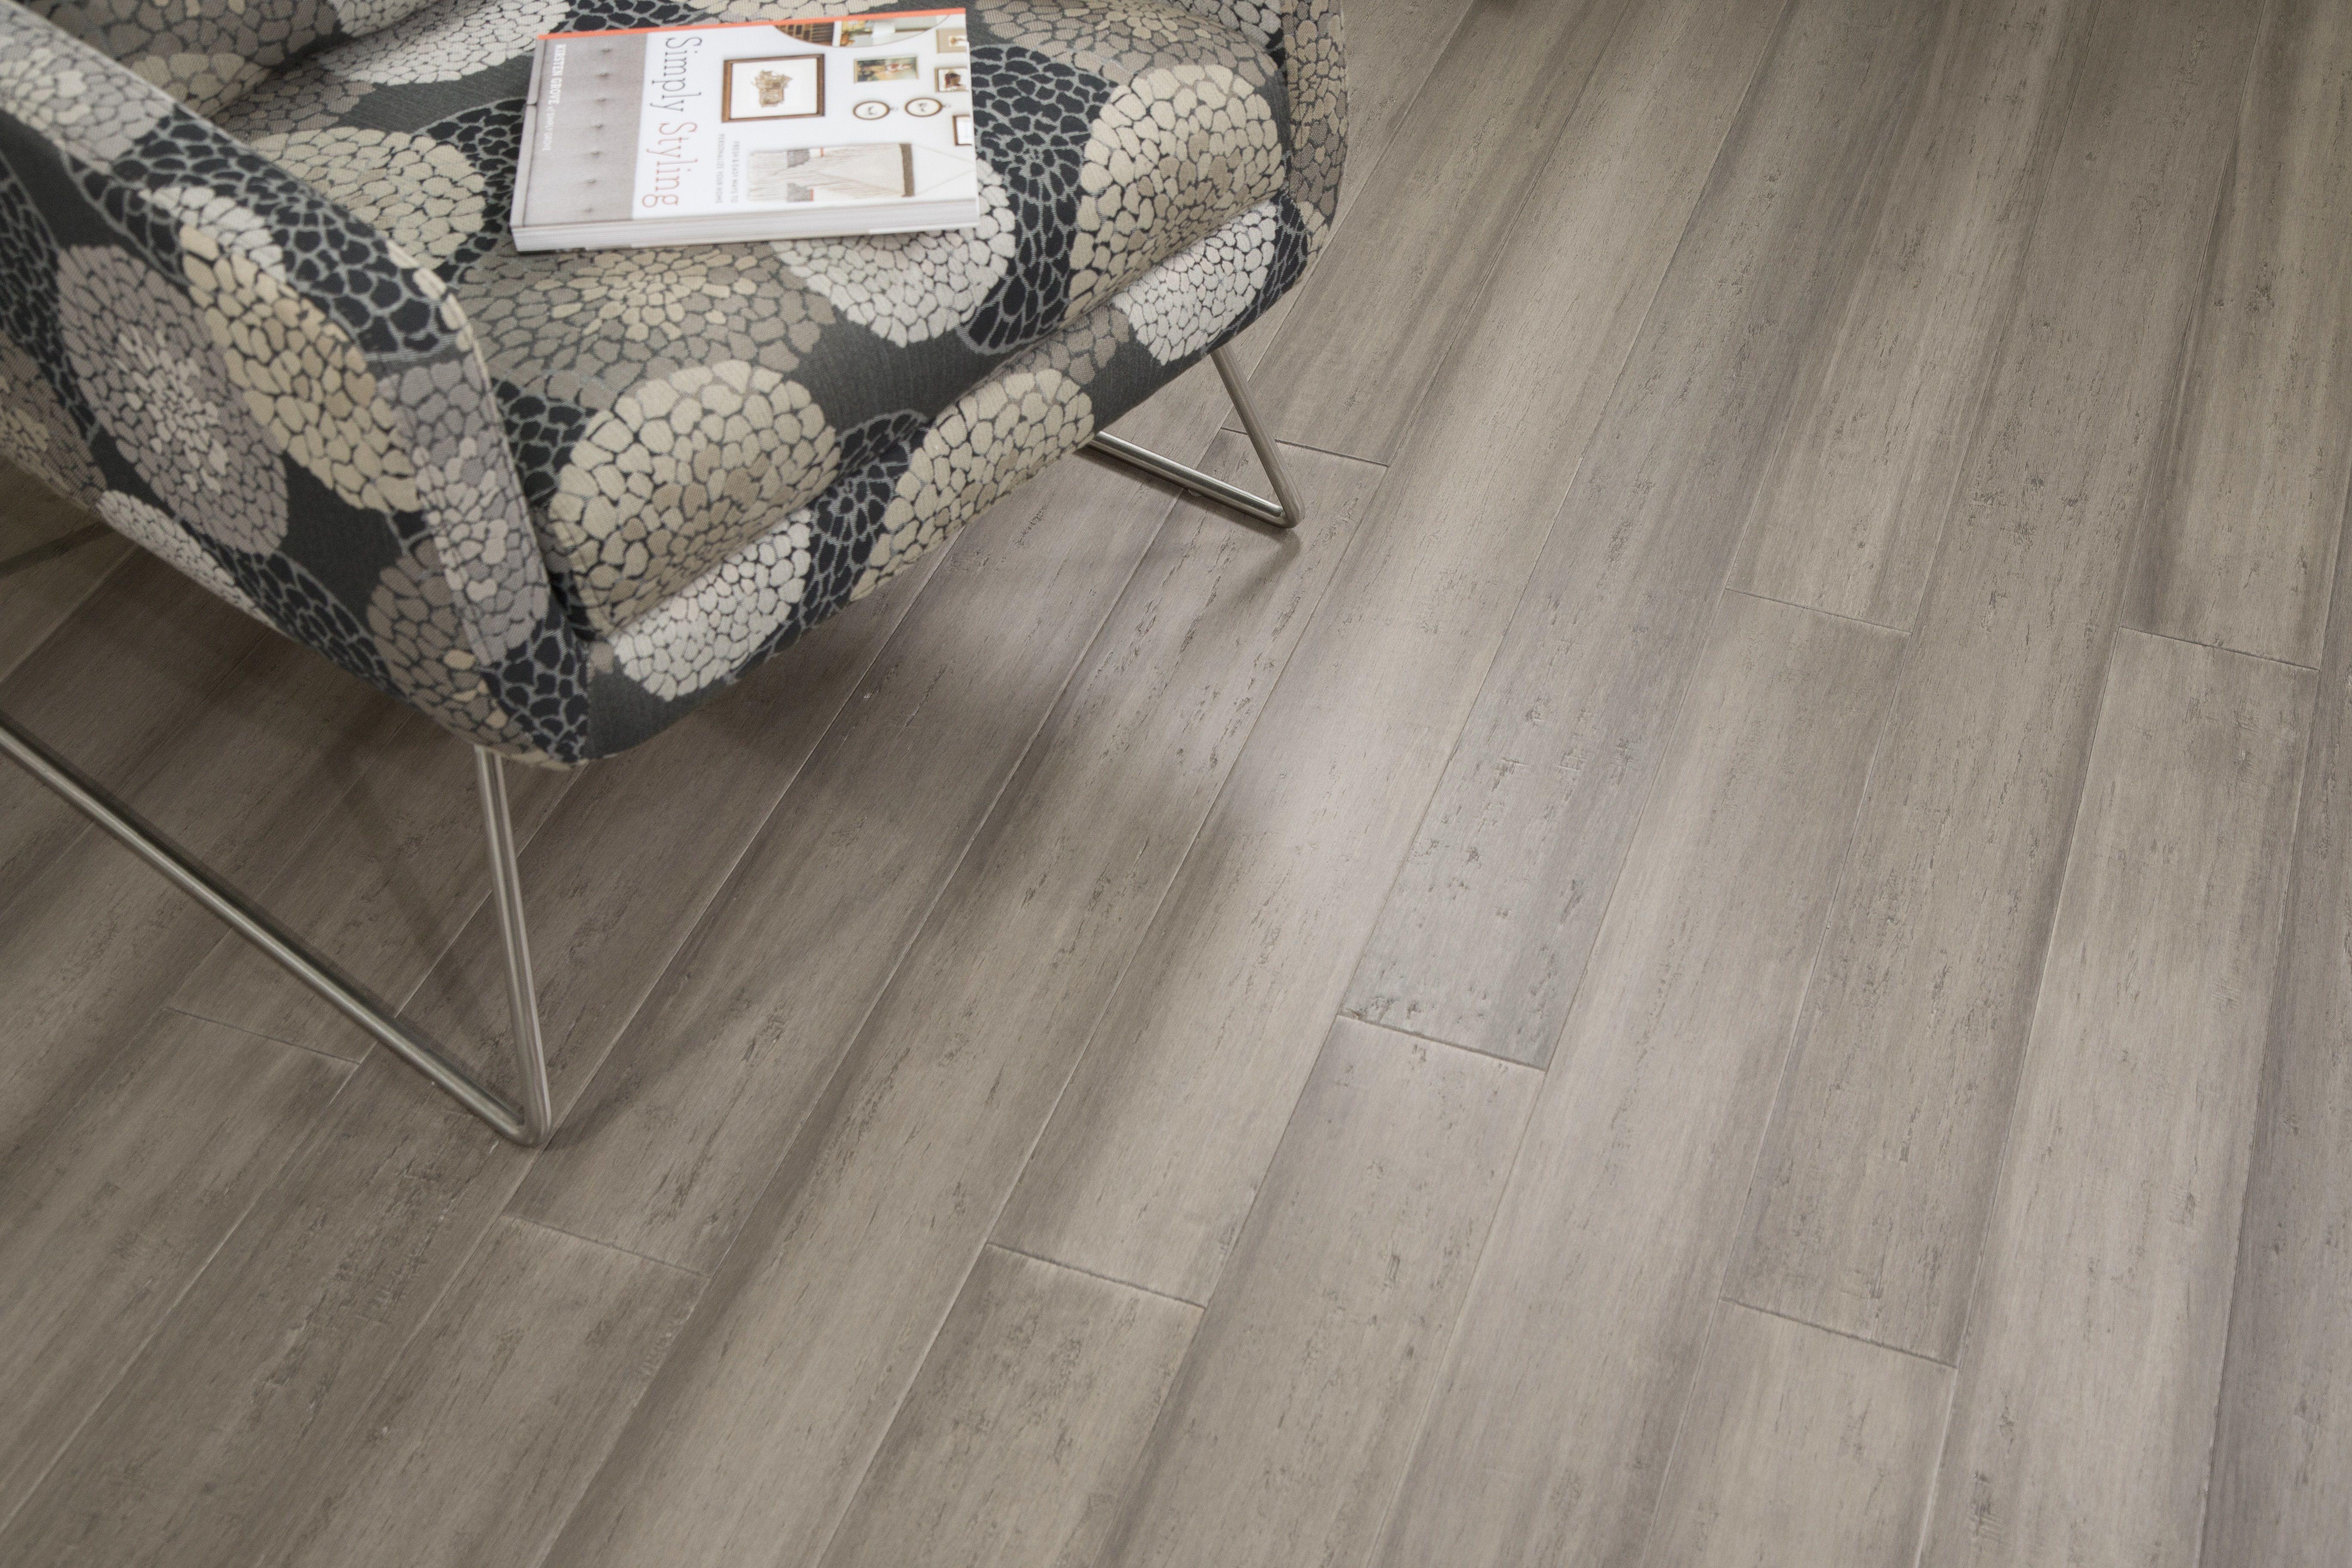 Pin On Light Hardwood Flooring Cali Bamboo Vinyl